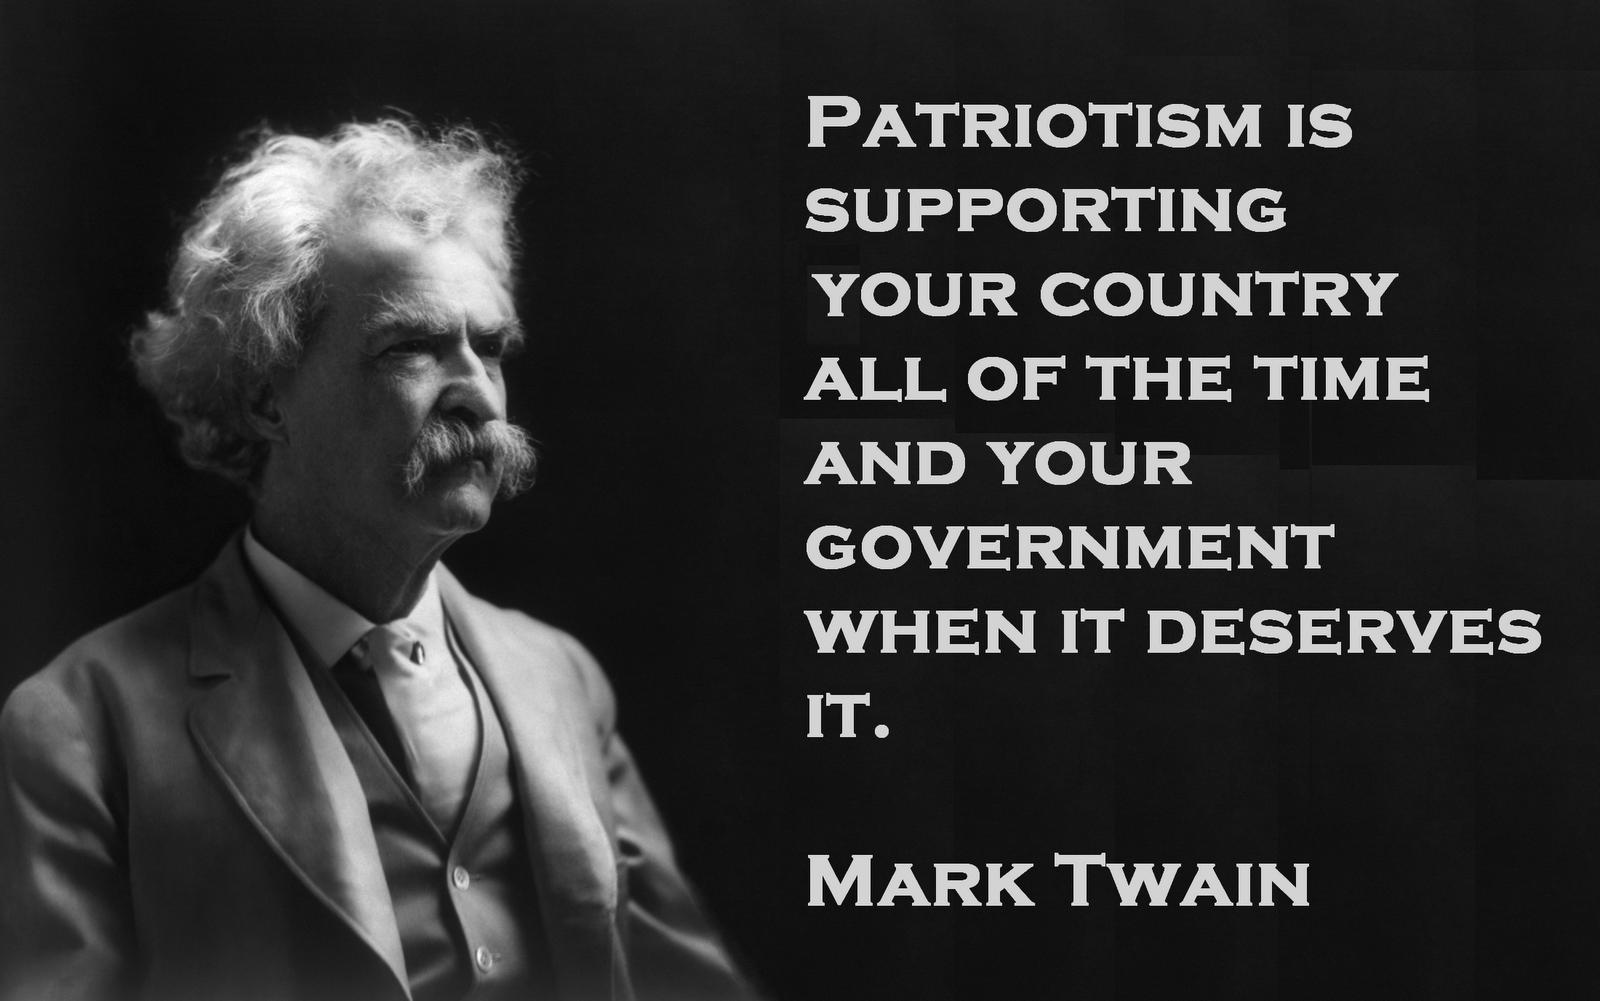 Top Ten Mark Twain Quotes A La Meme Quotes By Famous People Mark Twain Quotes Education Quotes